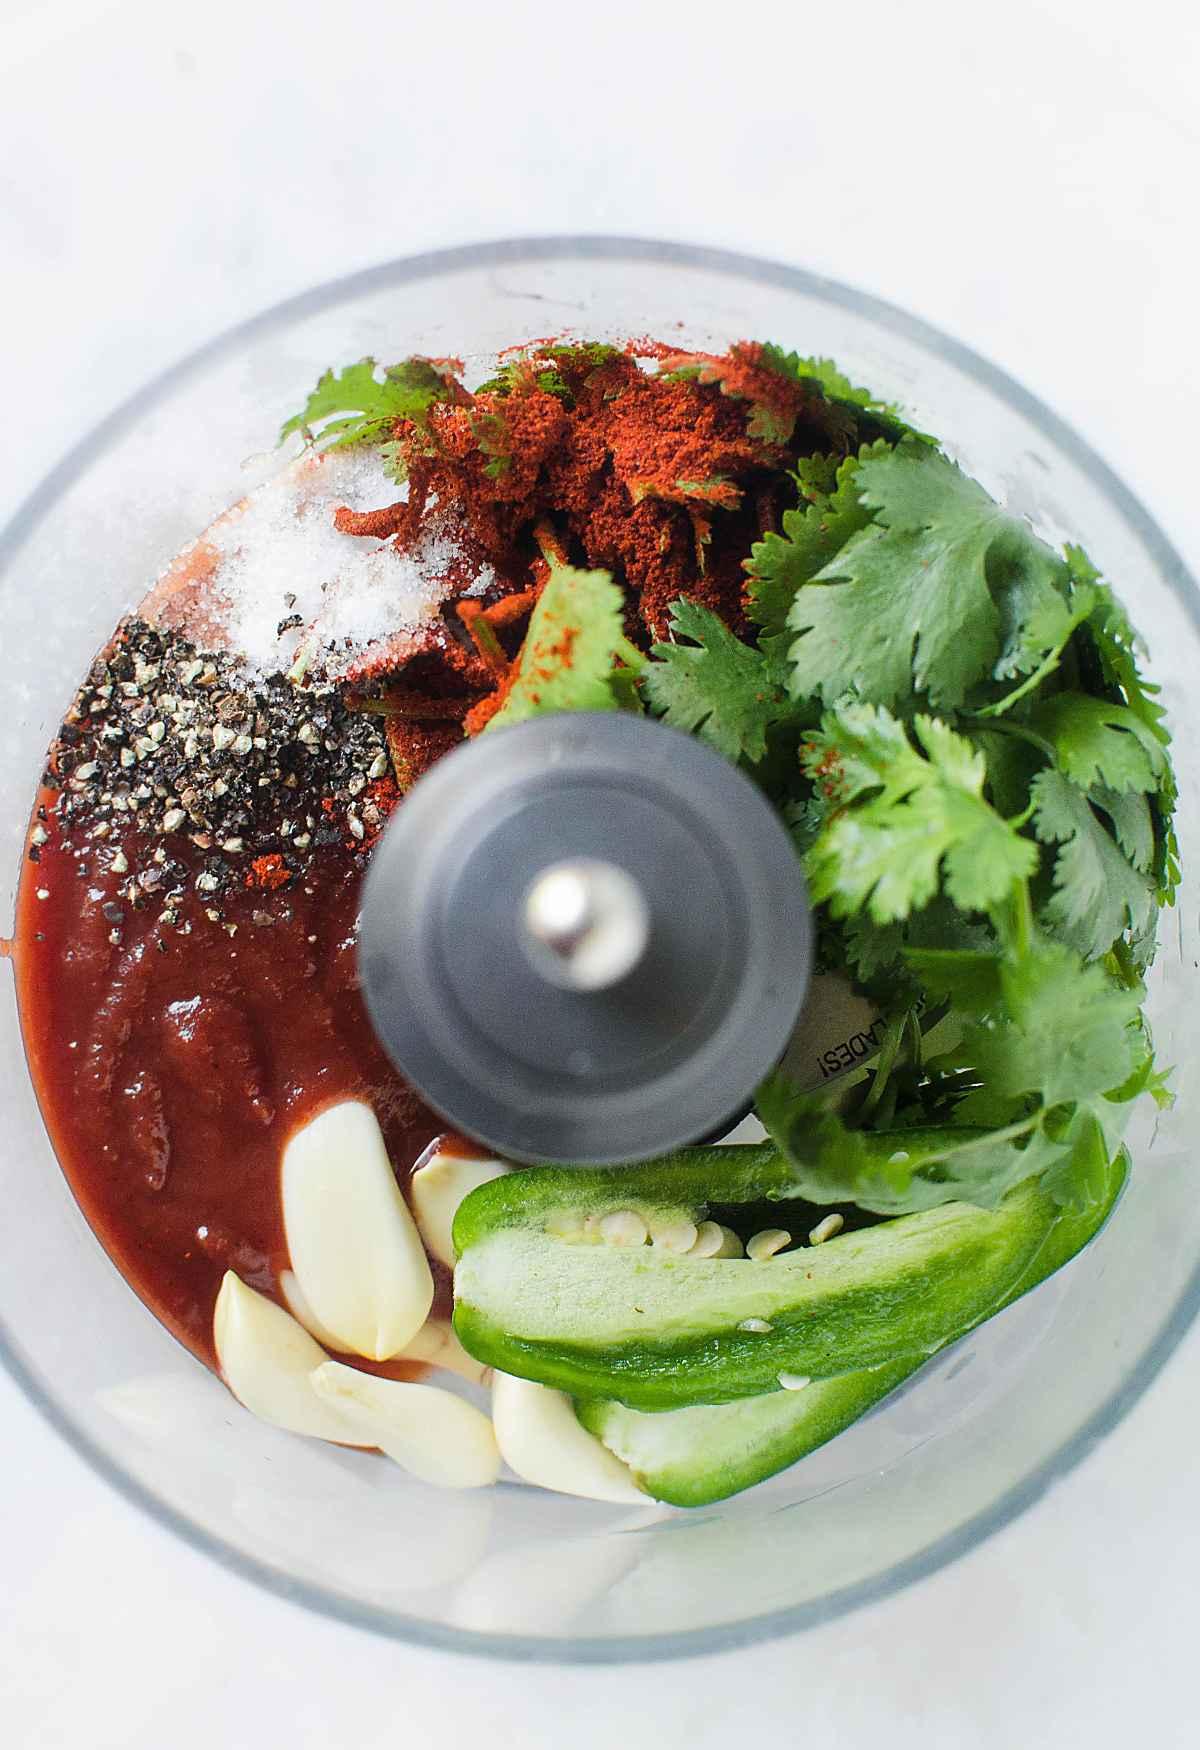 Healthy Oven Roasted Whole Cauliflower.   #cauliflower #vegan #veganthanksgiving #lowcarb